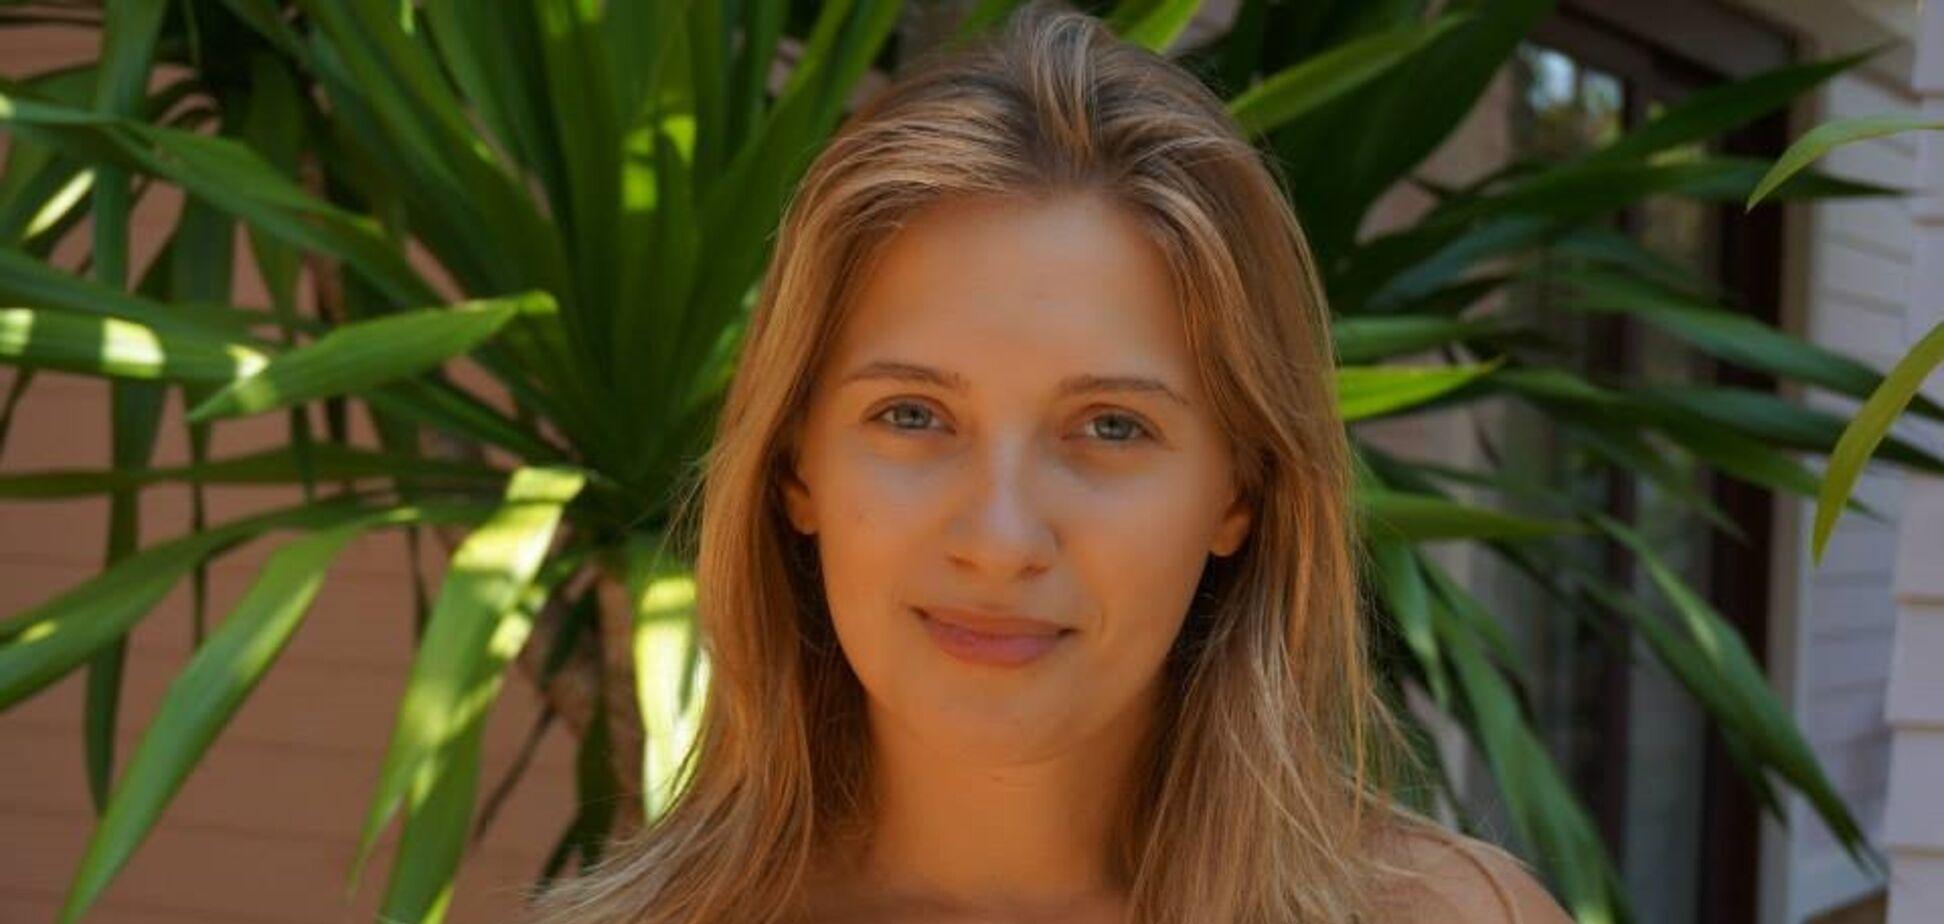 Катерина Терещенко – Таїланд 2018 рік